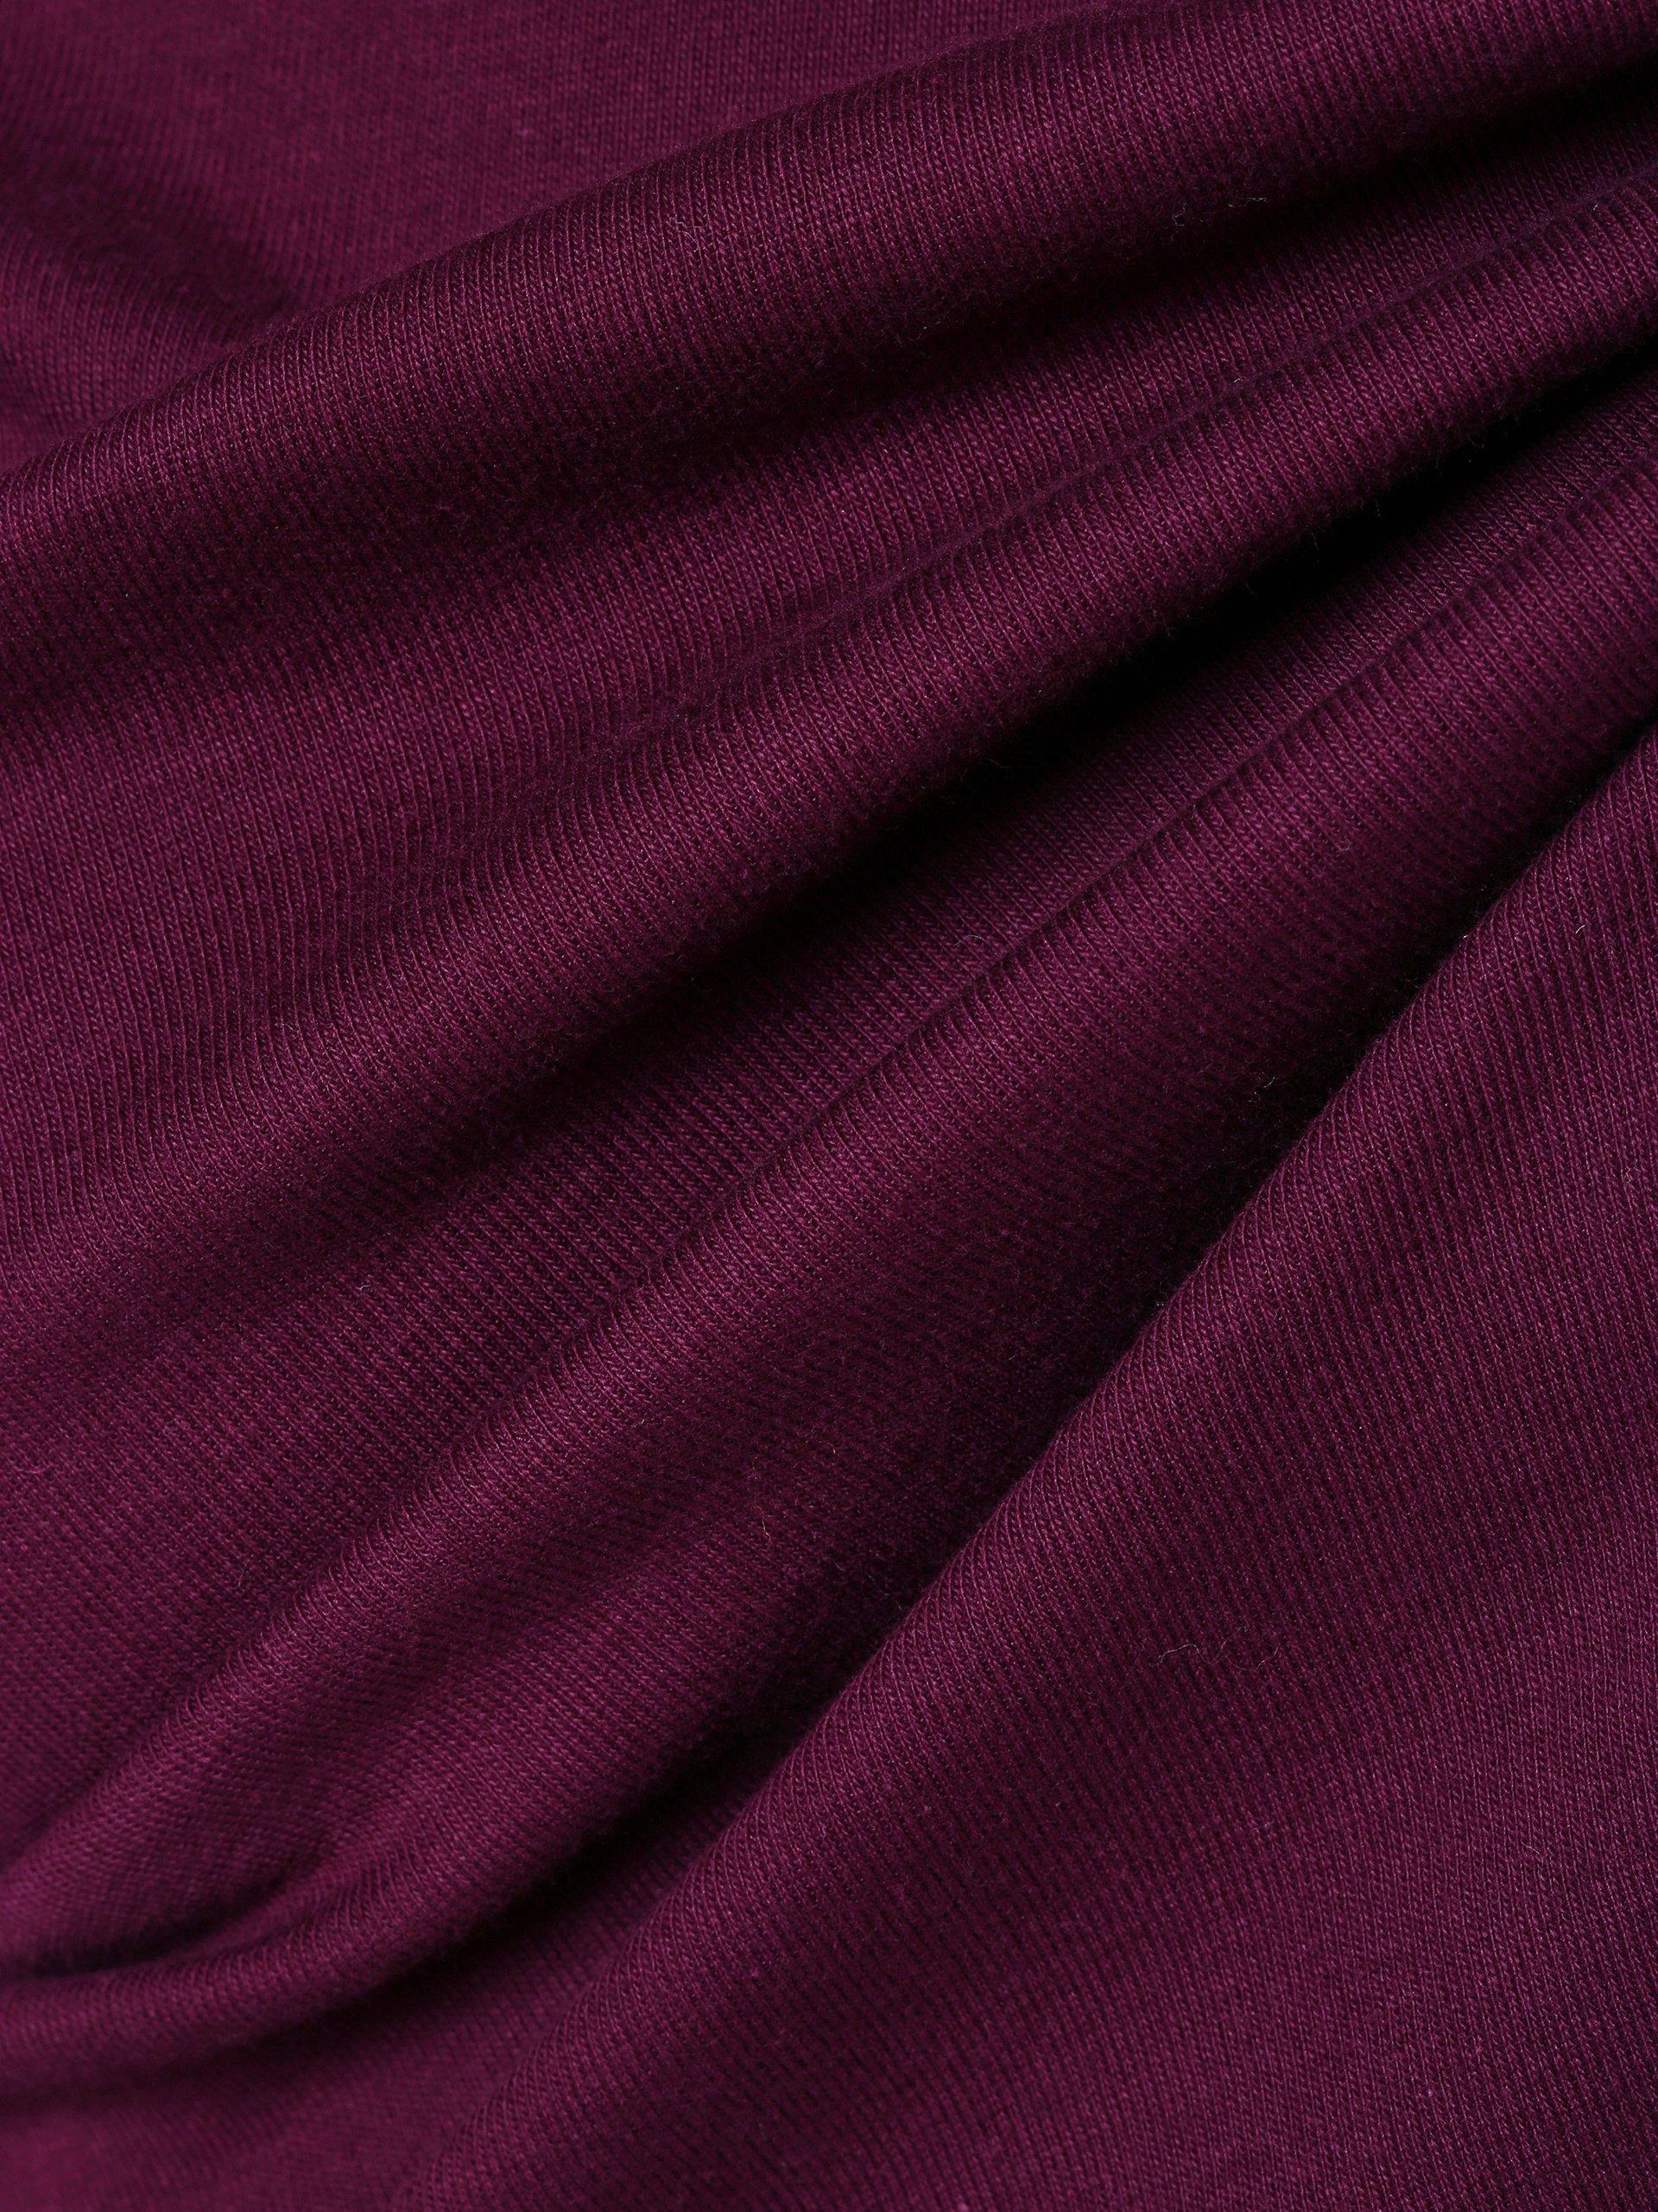 d8b80aa1ba9f02 brookshire Damen Langarmshirt aubergine uni online kaufen | PEEK-UND ...